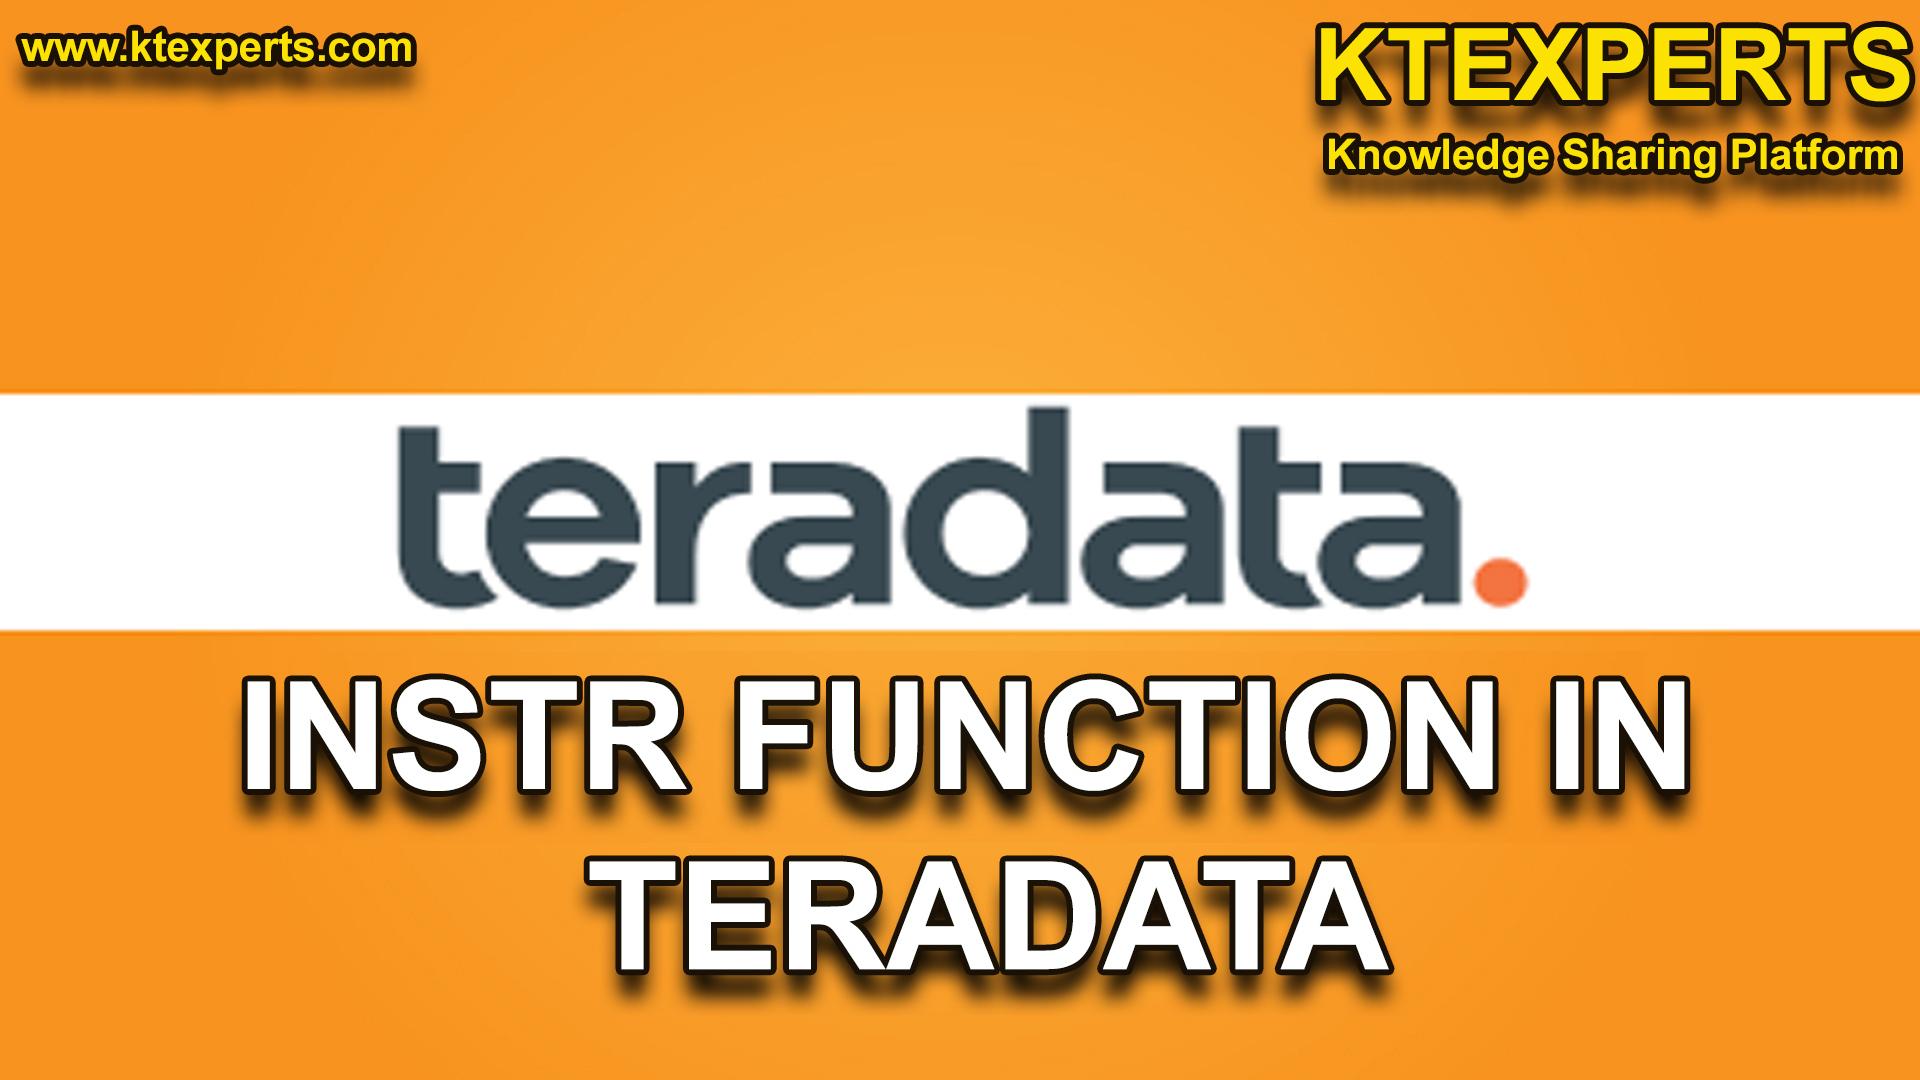 INSTR FUNCTION IN TERADATA